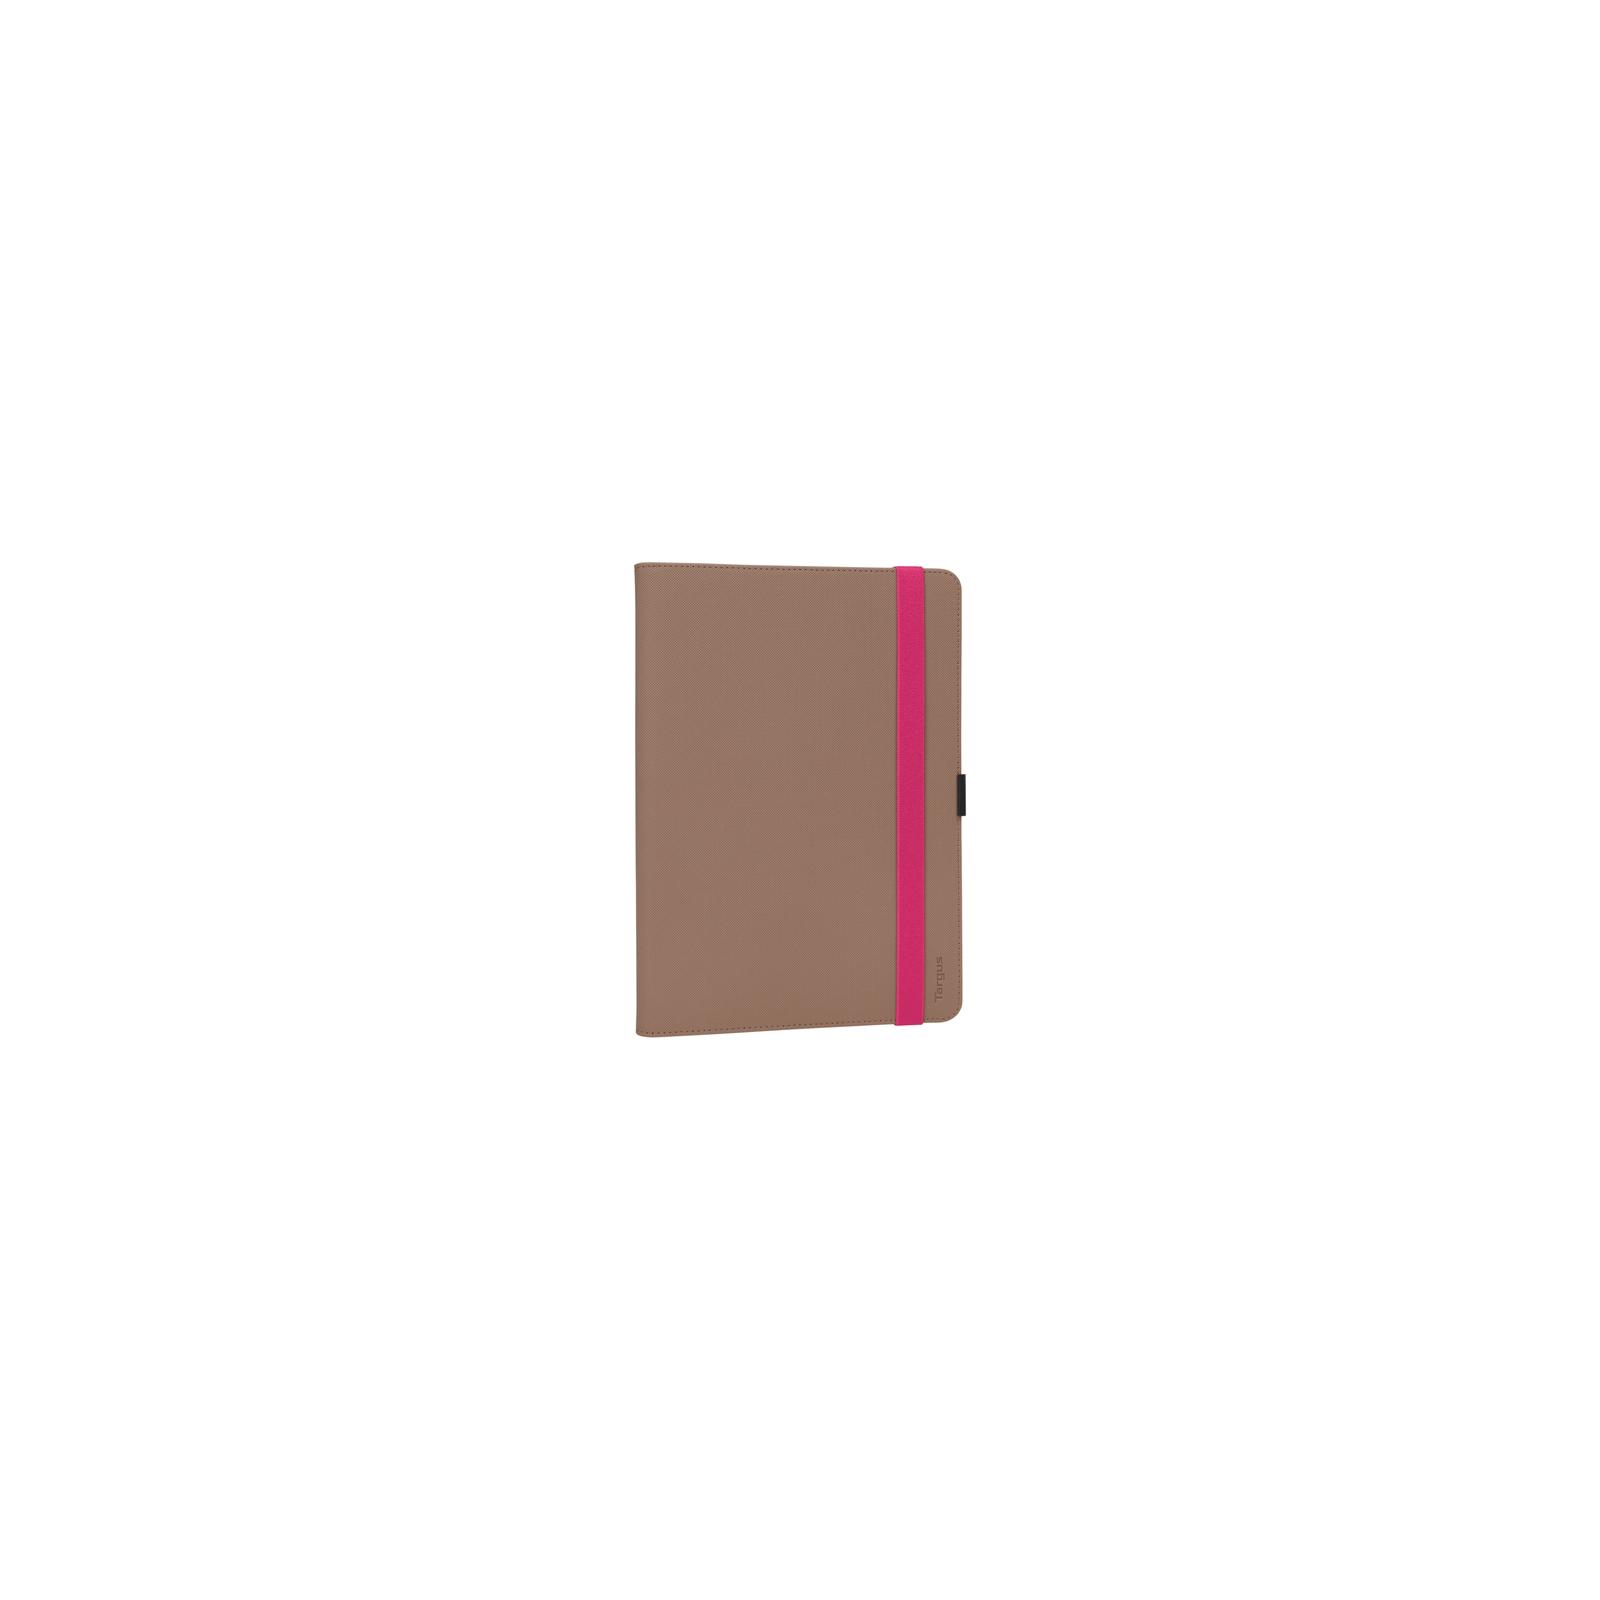 "Чехол для планшета Targus 7-8"" Universal BEIGE book (THZ33803EU)"